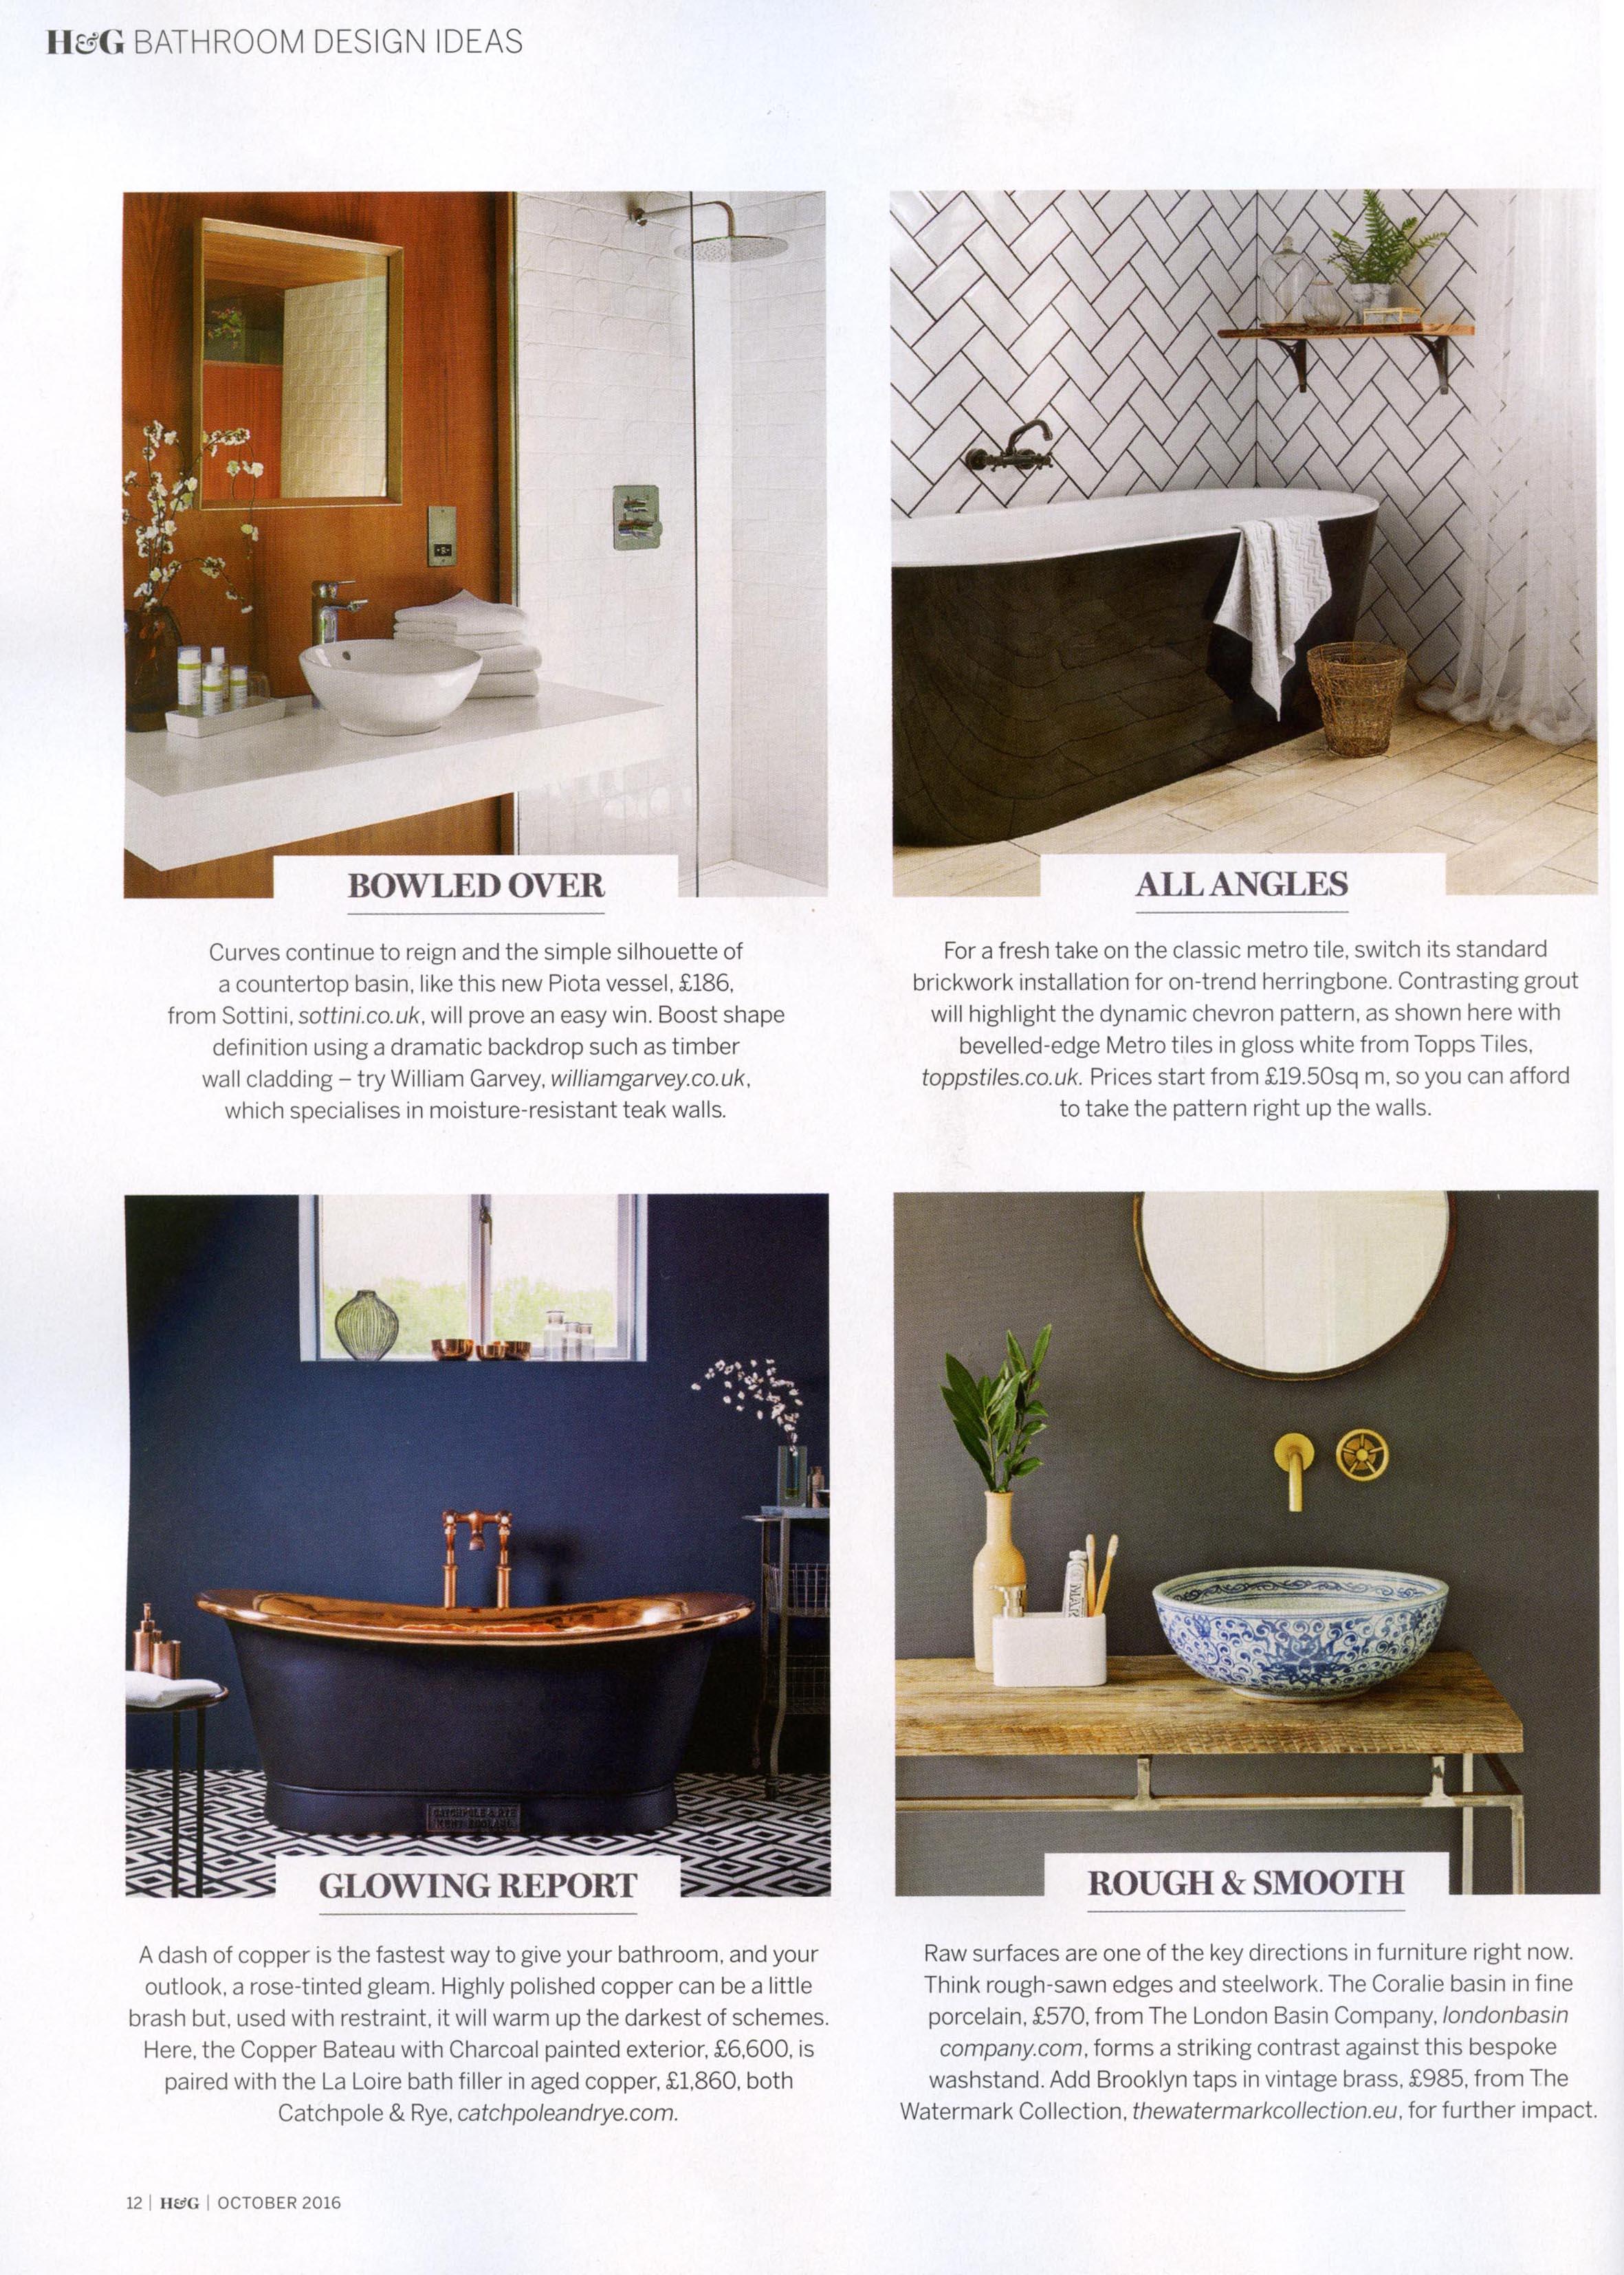 Homes & Gardens October 2016 - Dream Bathrooms Supplement LBC.jpg